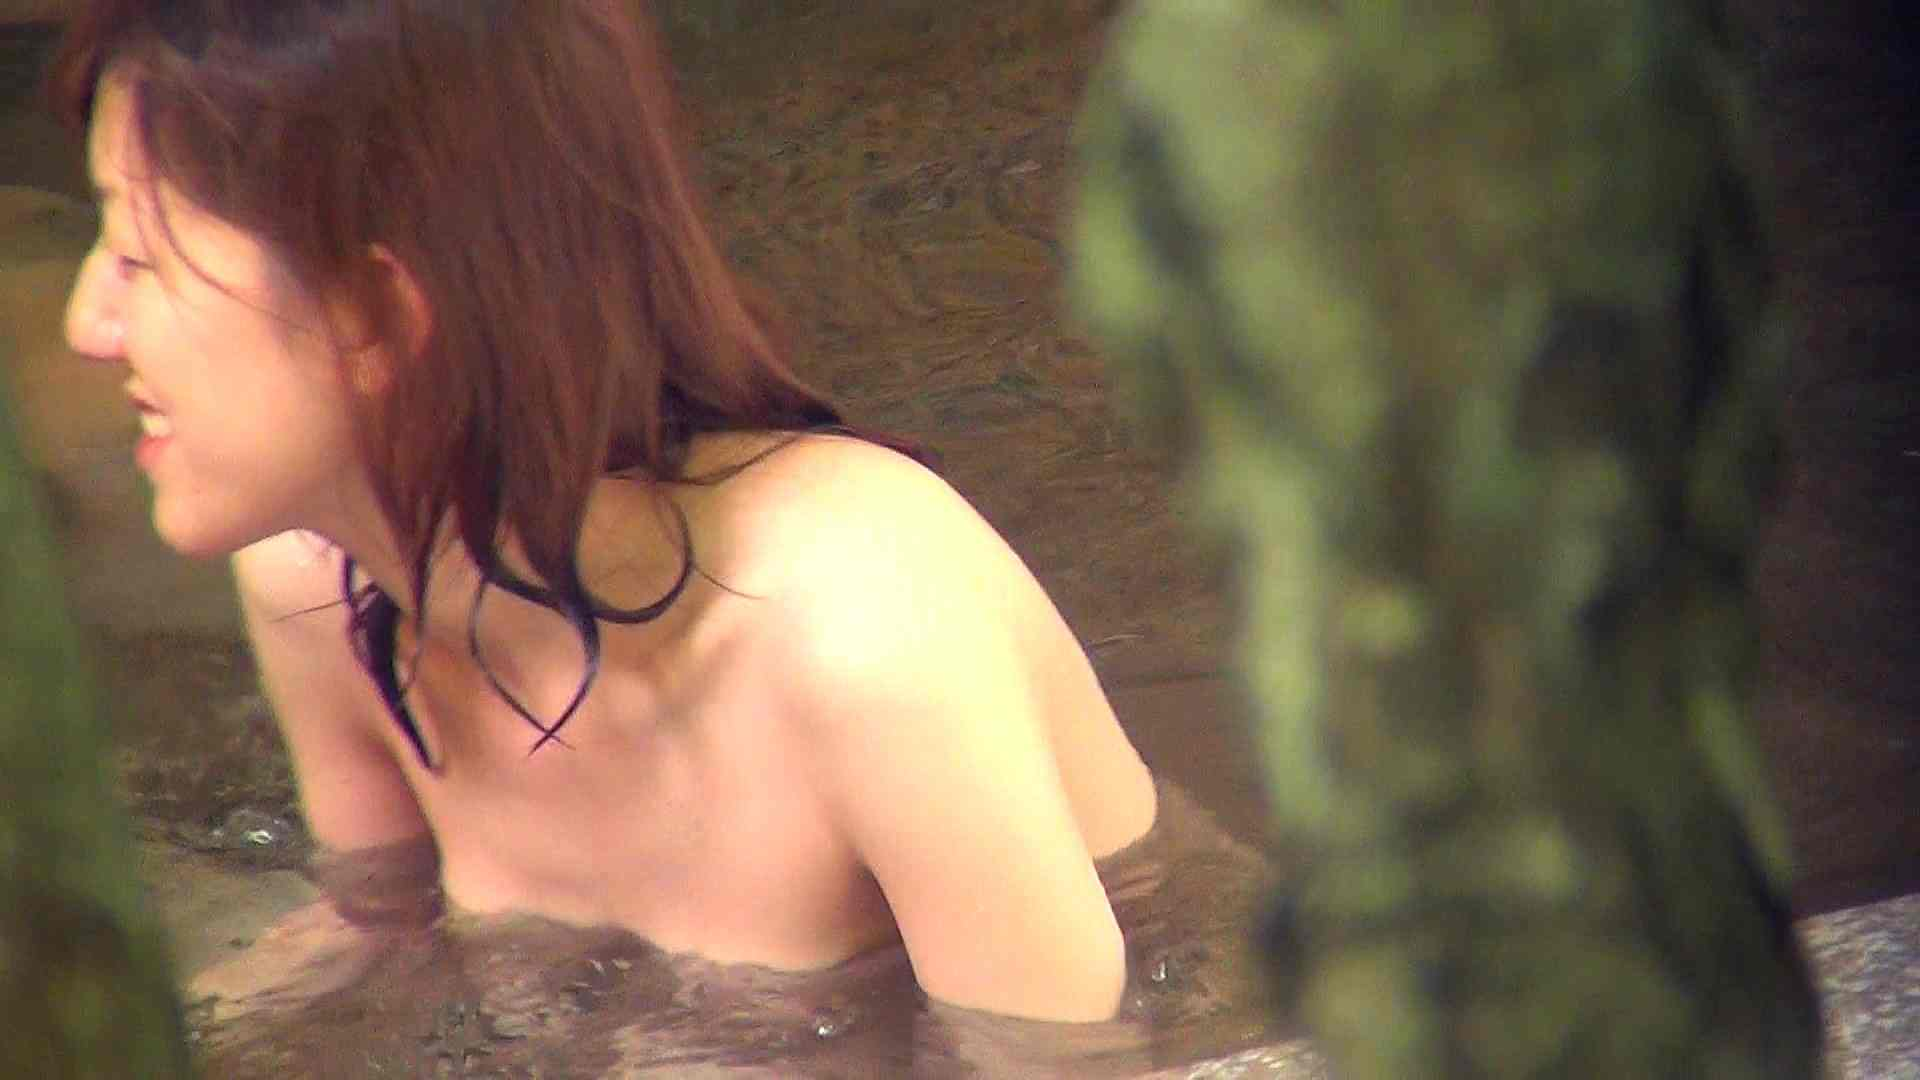 Aquaな露天風呂Vol.277 露天  75連発 9